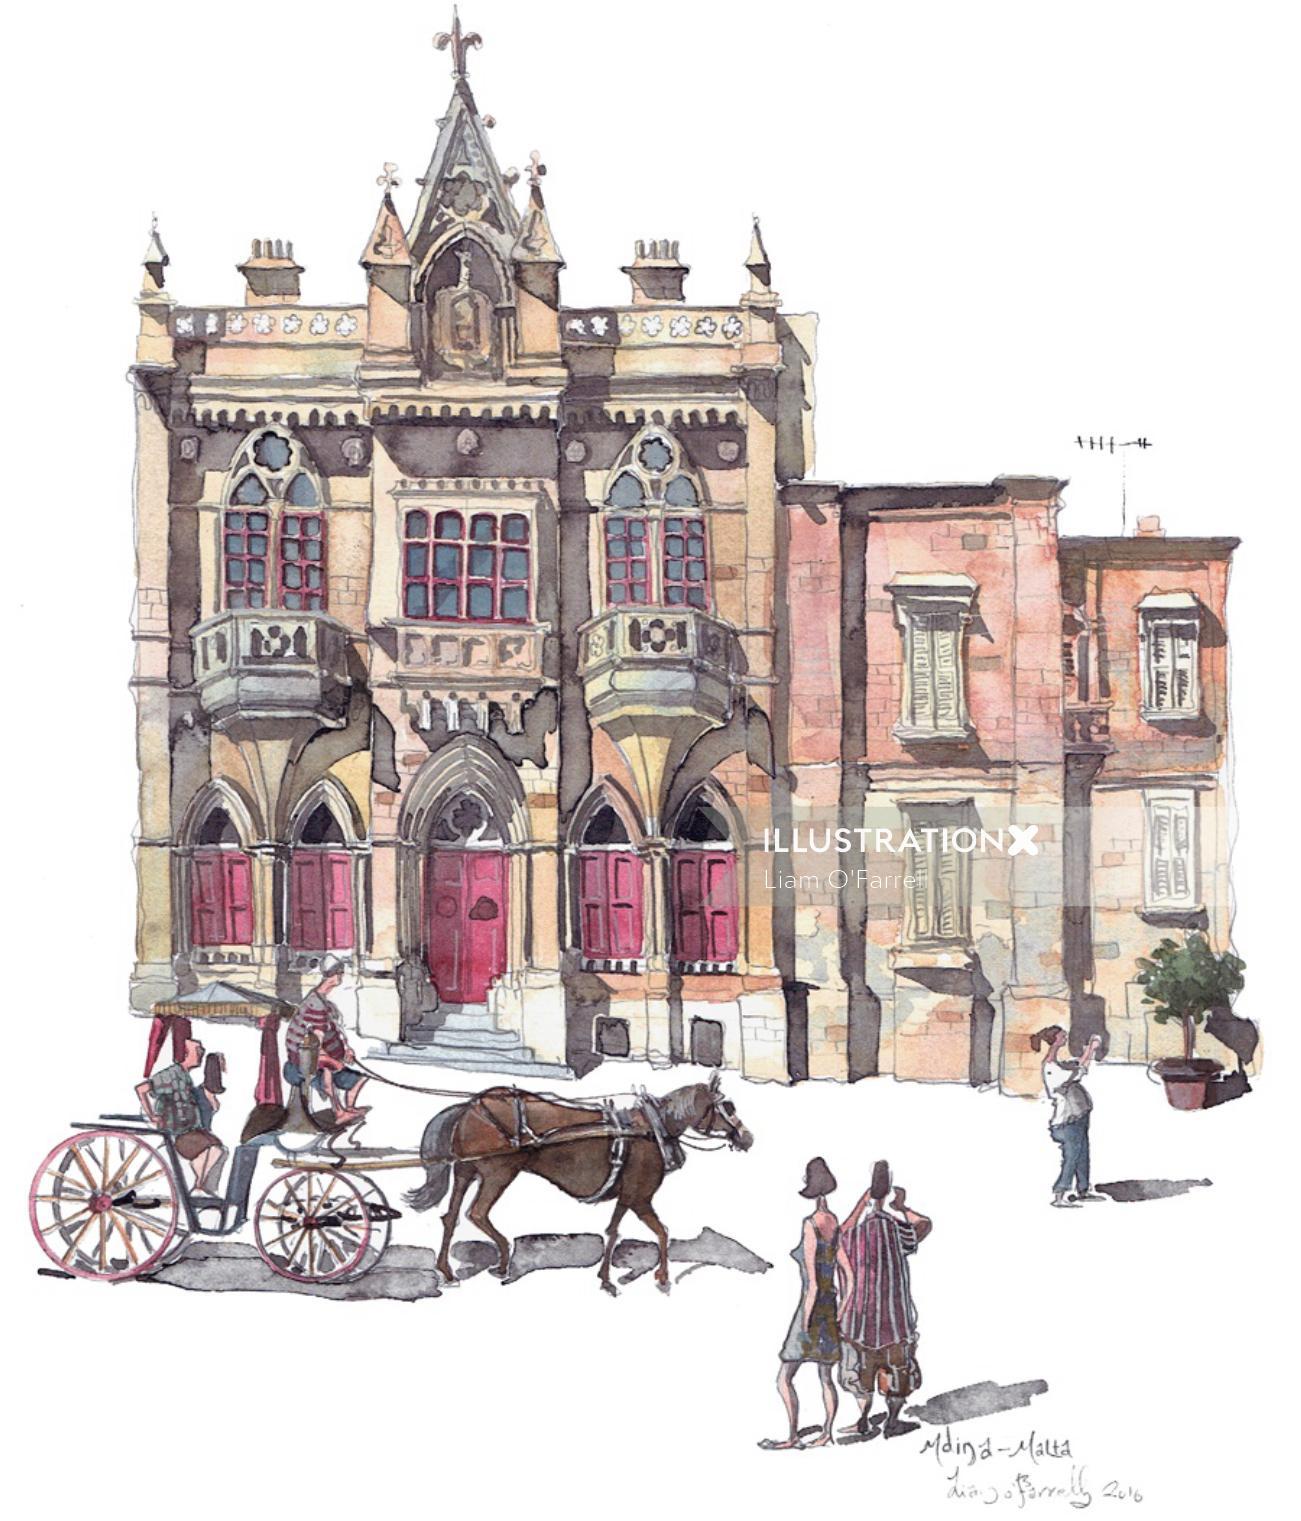 Illustration of building